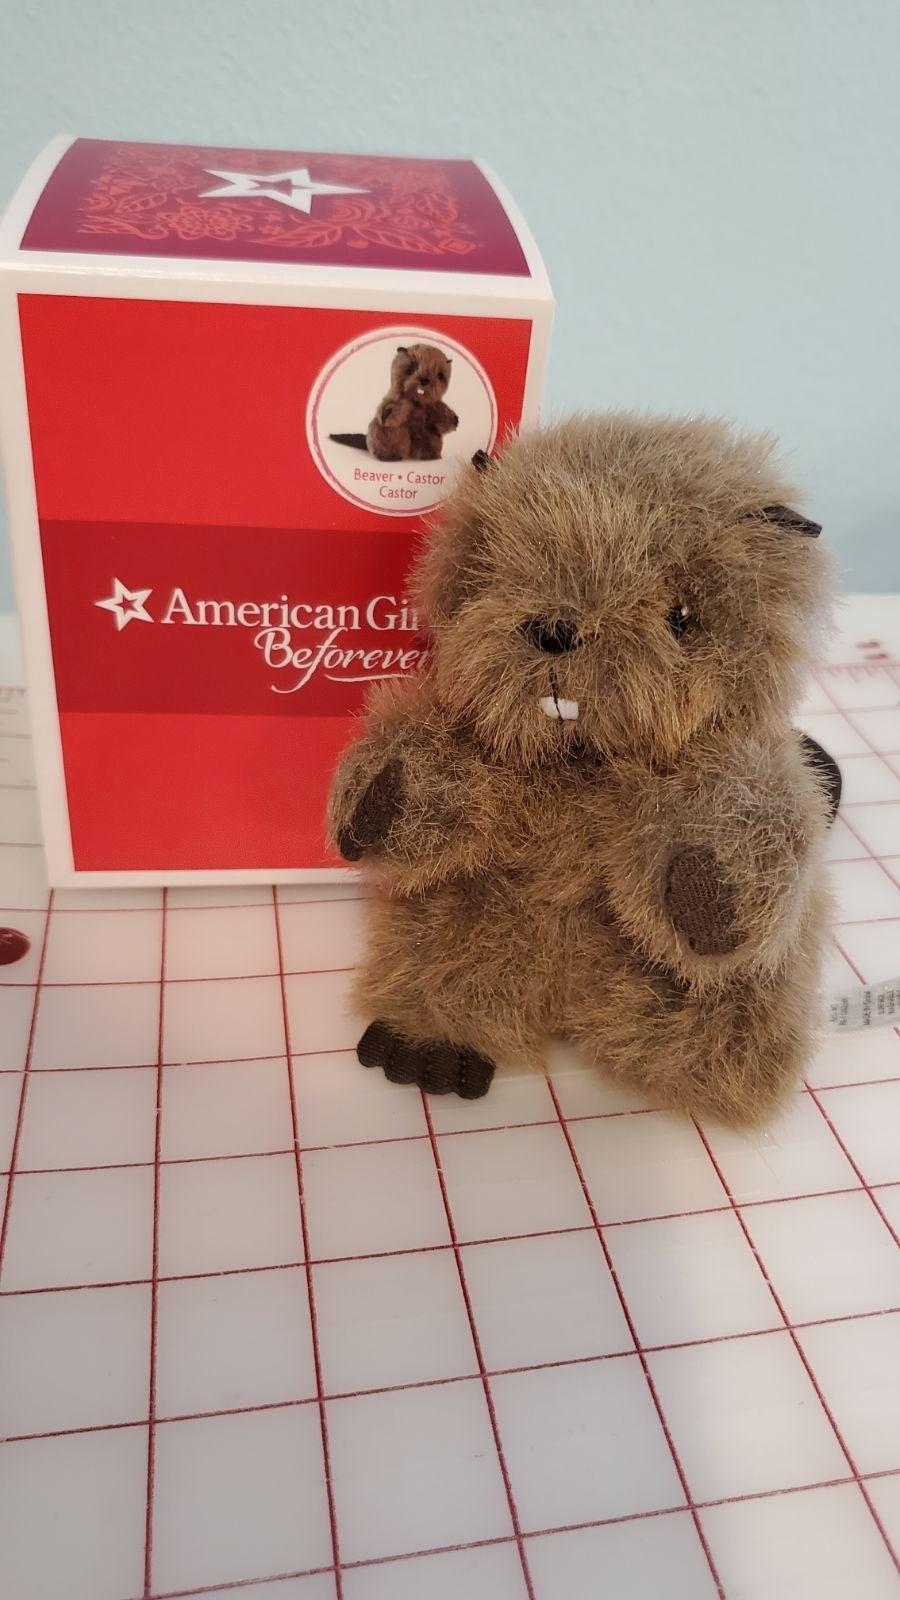 American Girl doll Kaya beaver